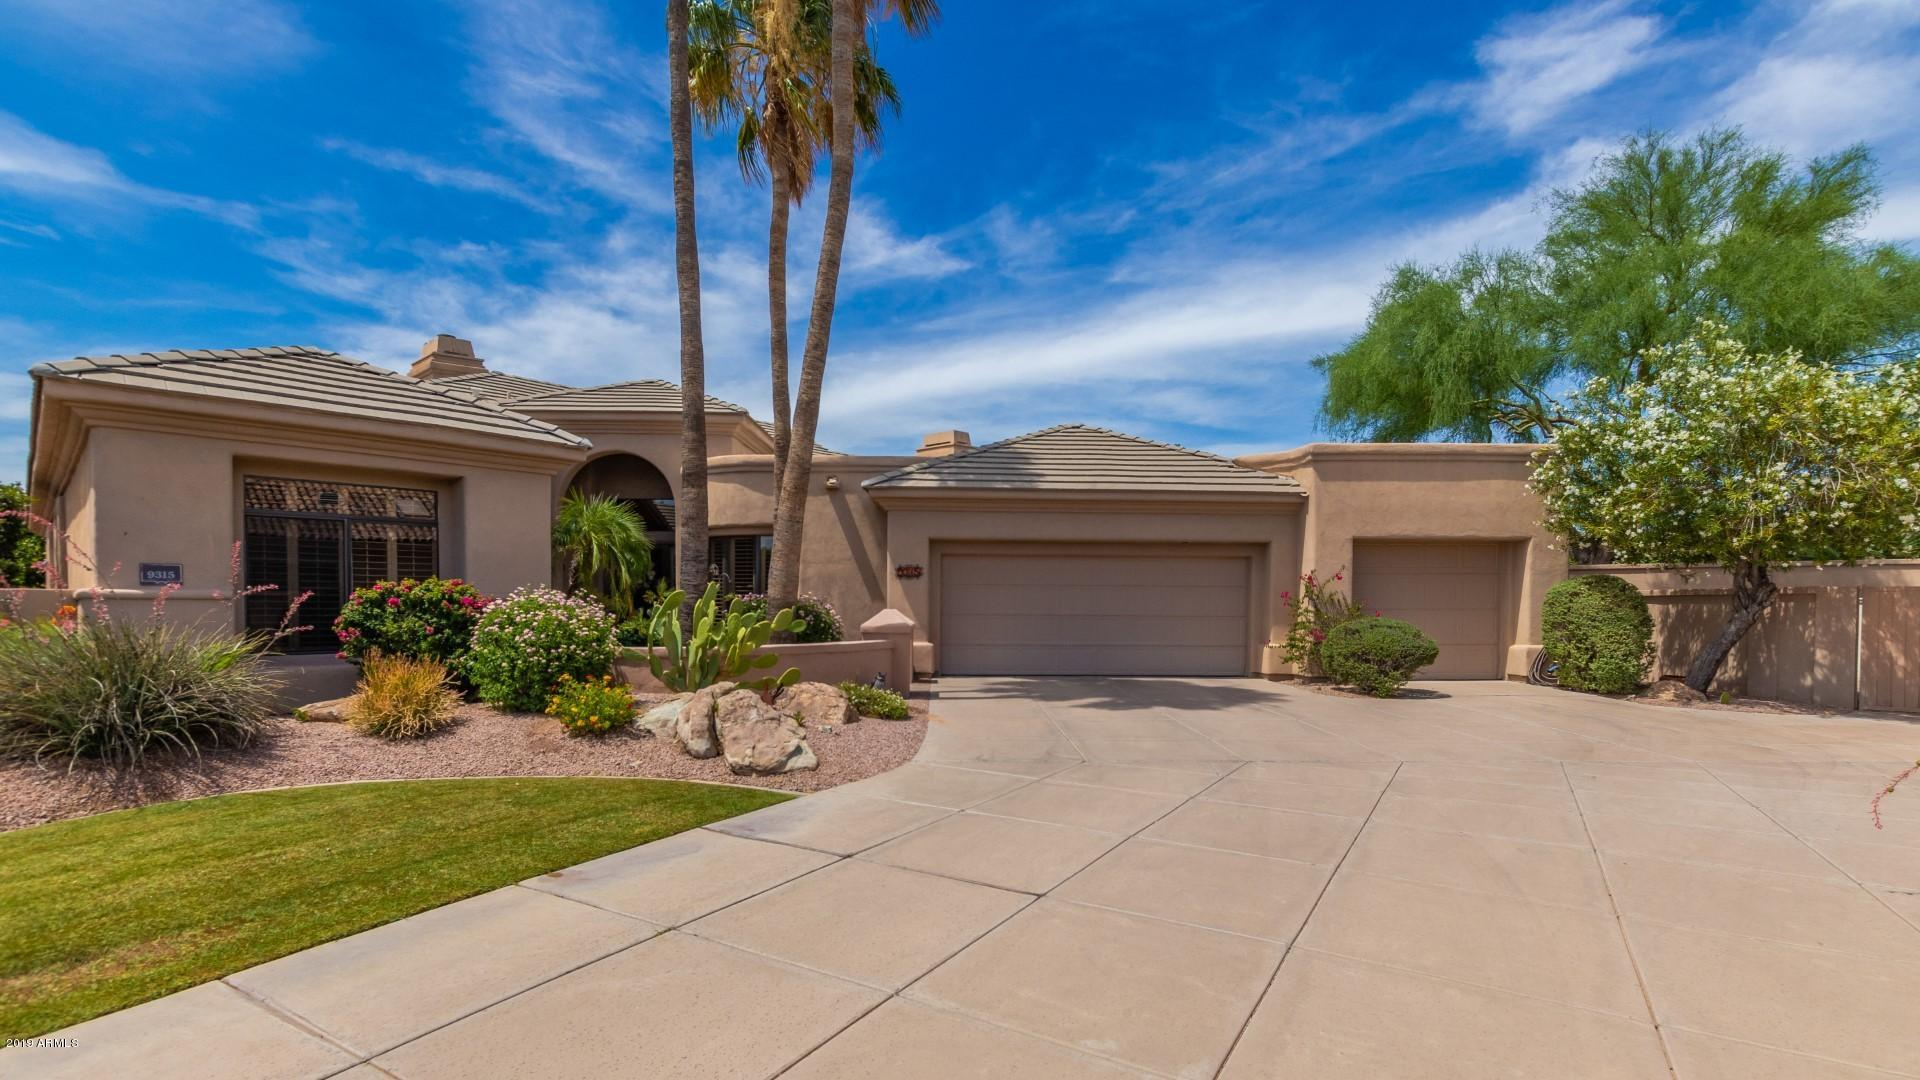 Photo of 9315 N 117TH Street, Scottsdale, AZ 85259